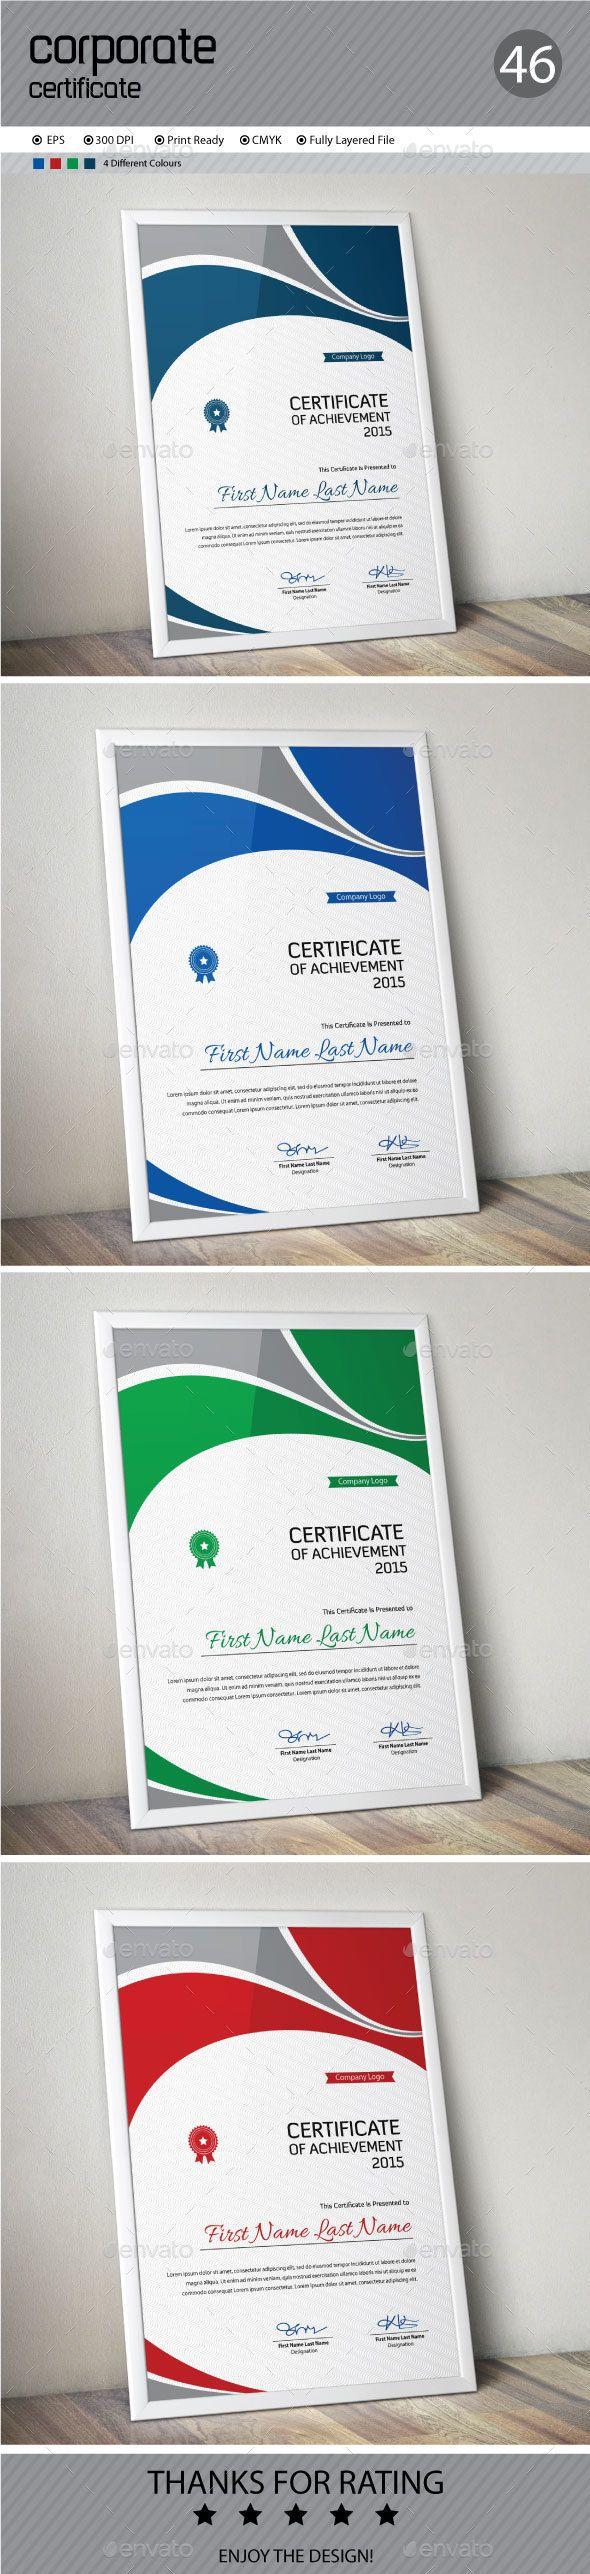 Certificate Template Vector EPS. Download here: http://graphicriver.net/item/certificate/14275388?ref=ksioks